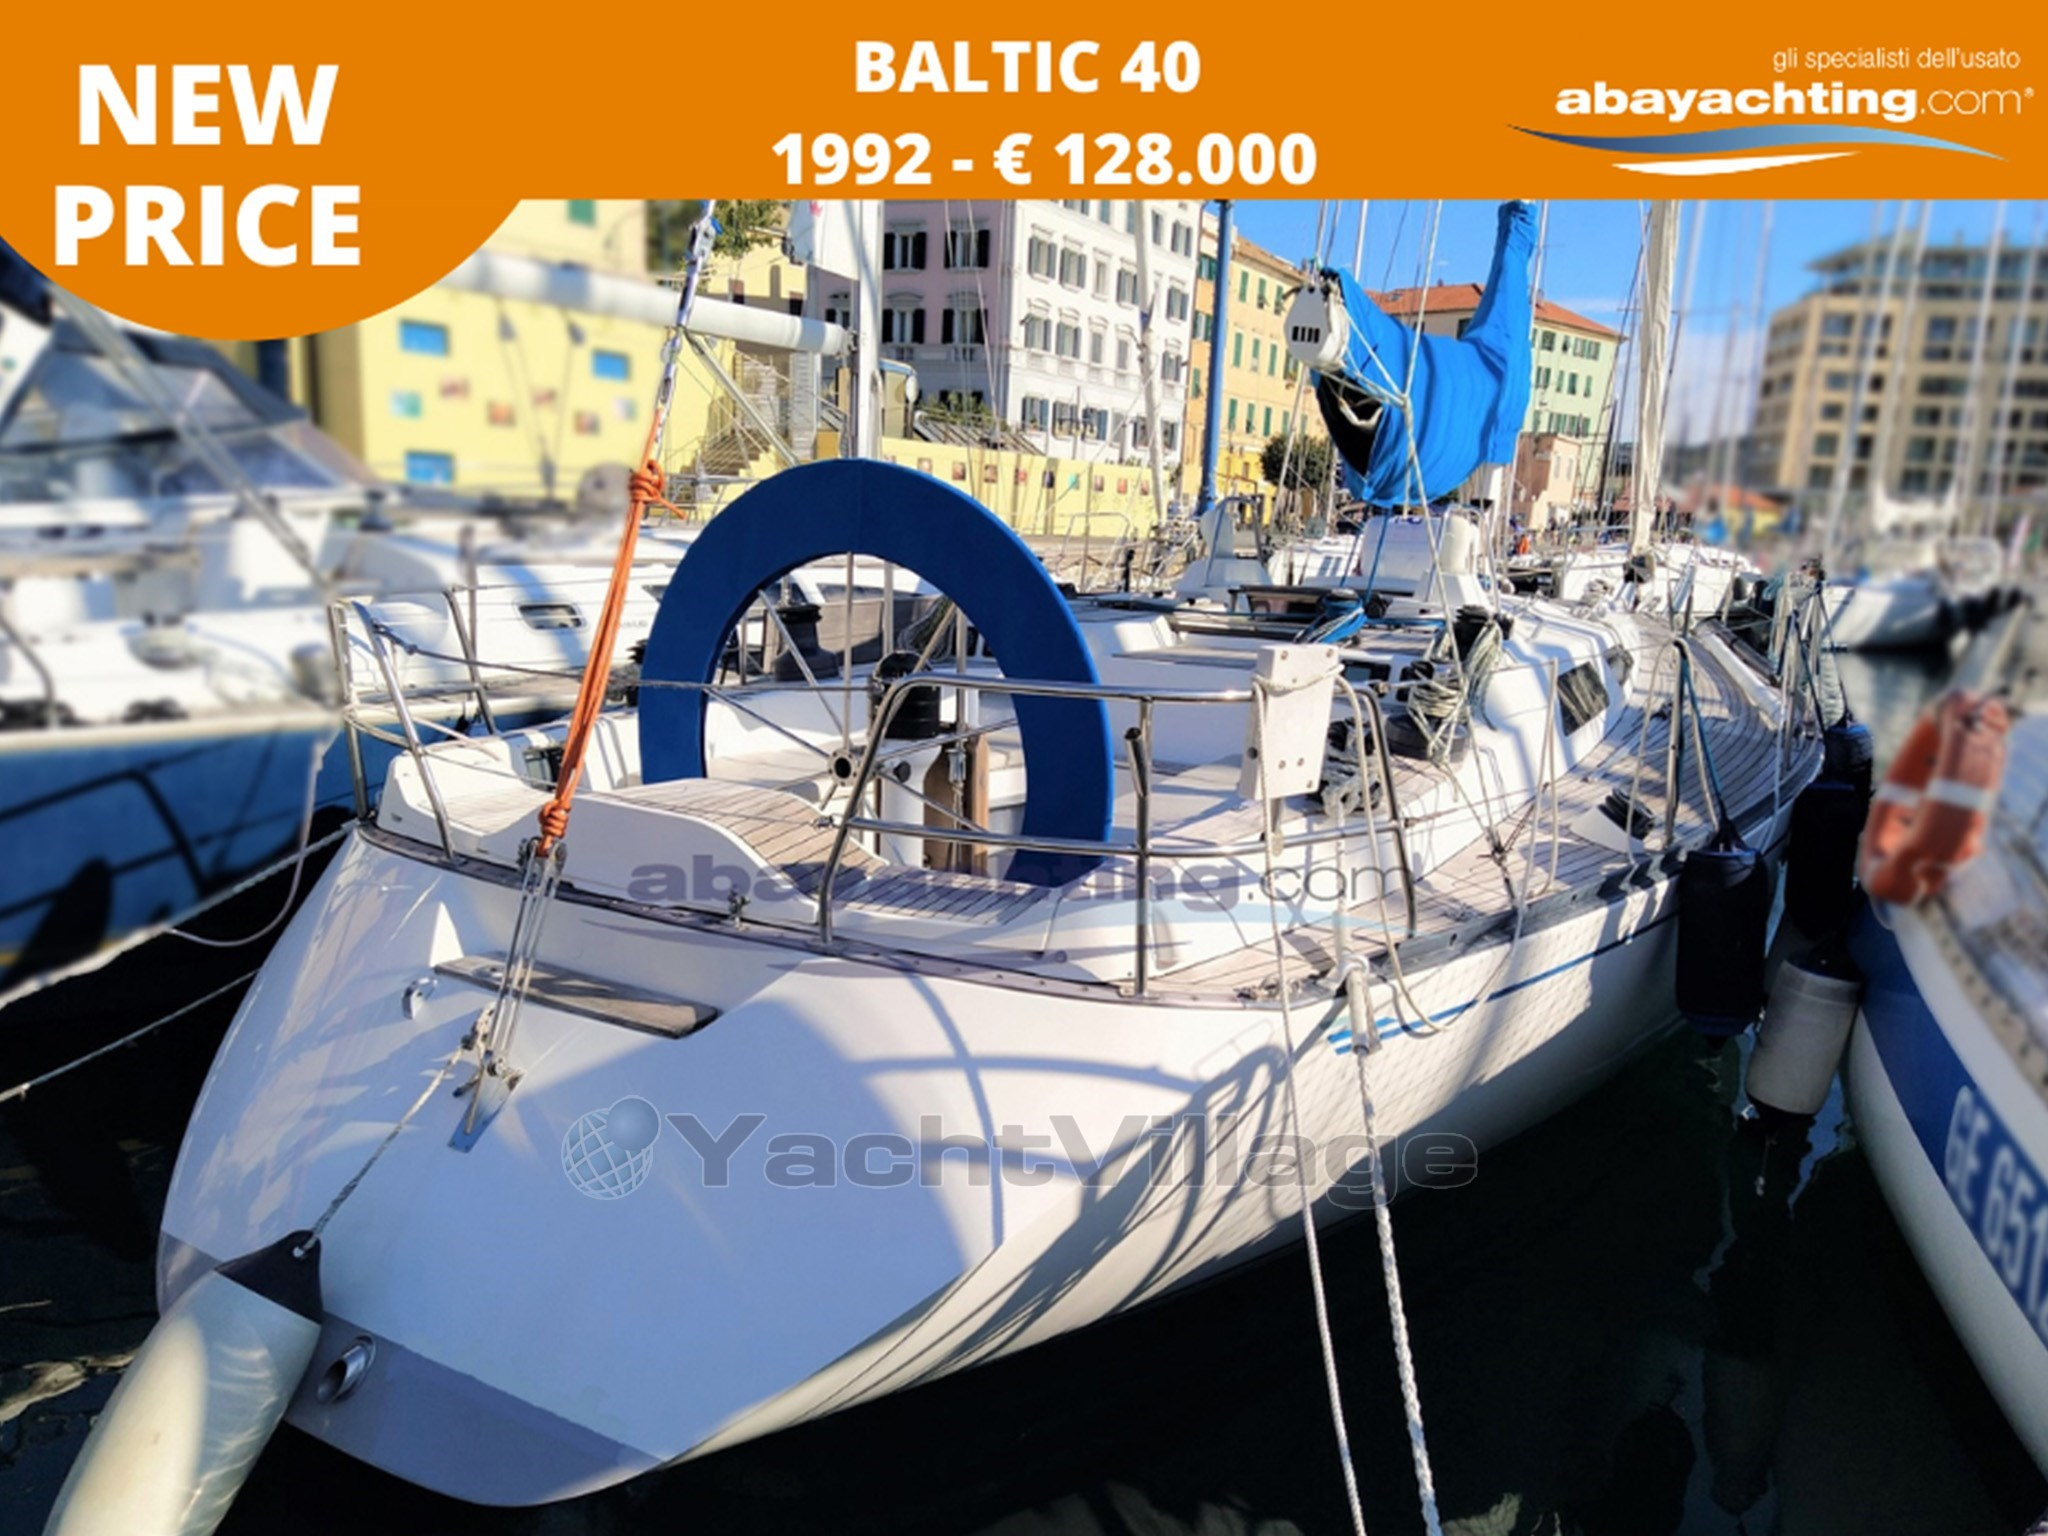 Abayachting Nuovo prezzo Baltic 40